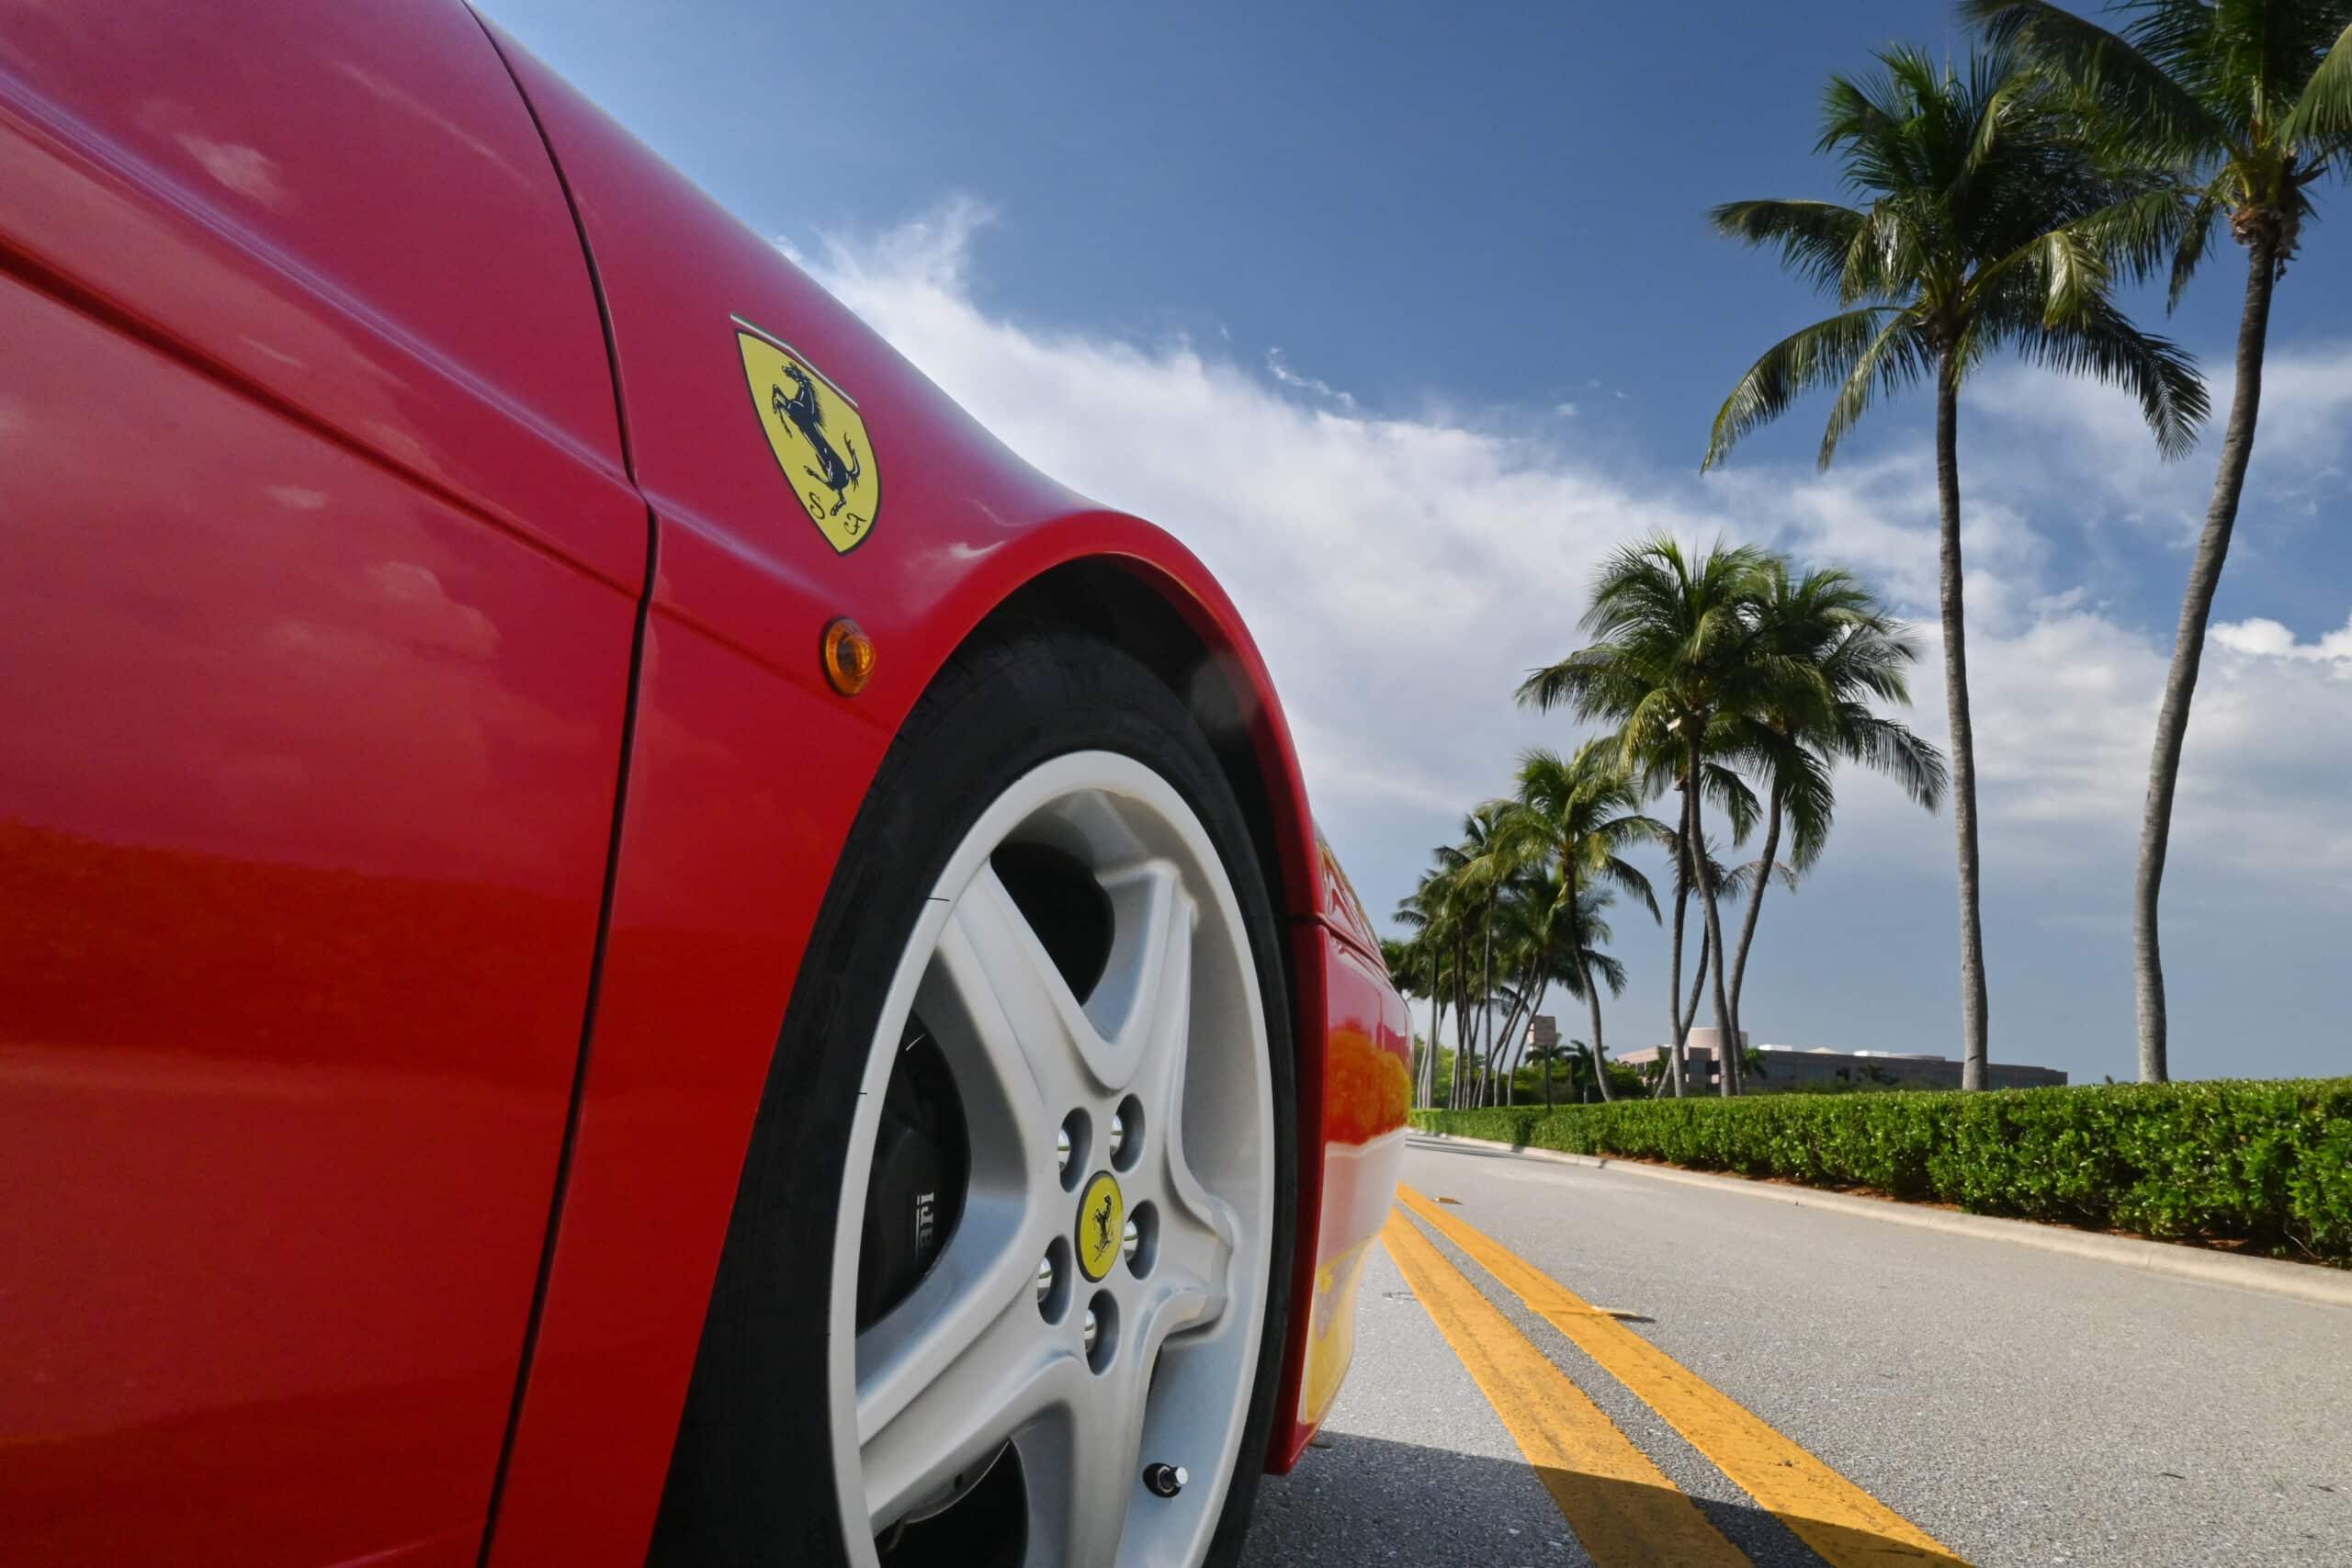 1993 Ferrari 512TR, 18K MILES, BELT SERVICE IN APRIL OF 2021, DOCUMENTED HISTORY, SWISS MARKET CAR|1993 Ferrari Testarossa 512 TR